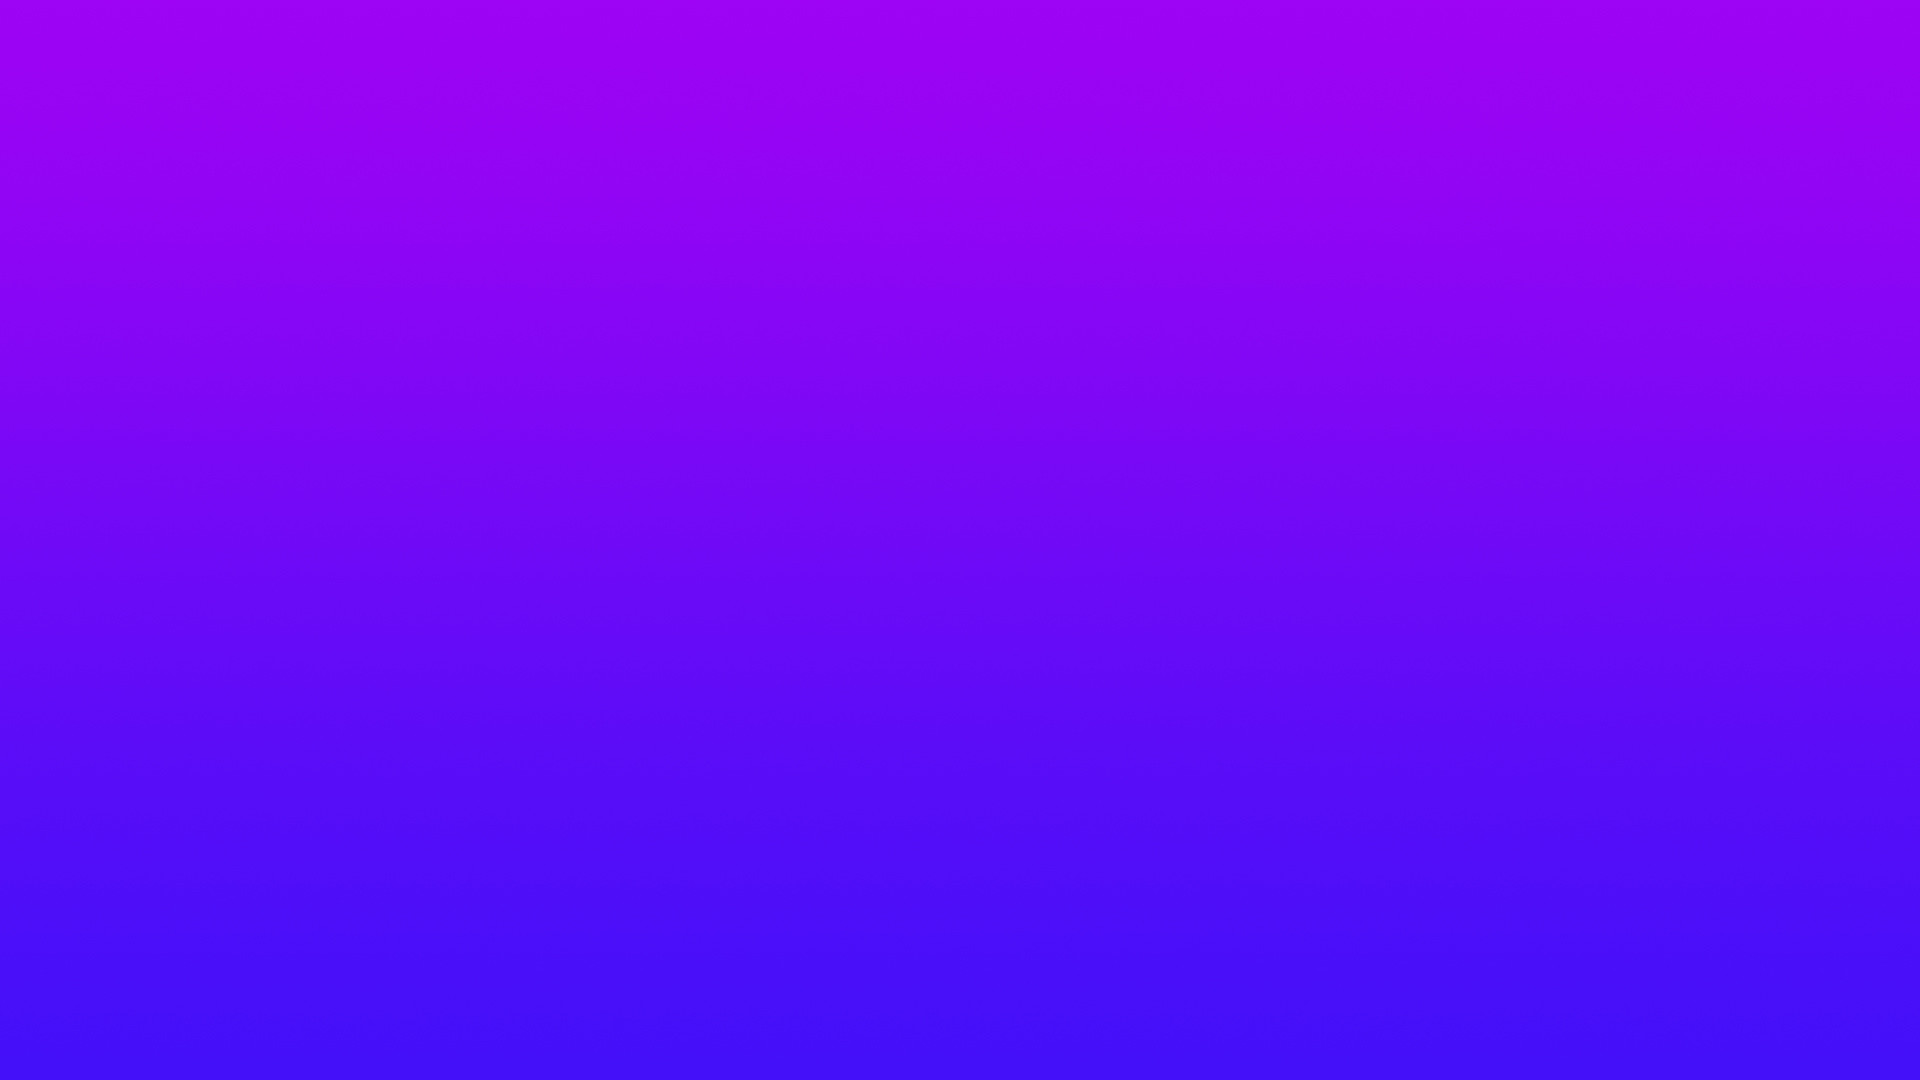 ColorBG07.jpg